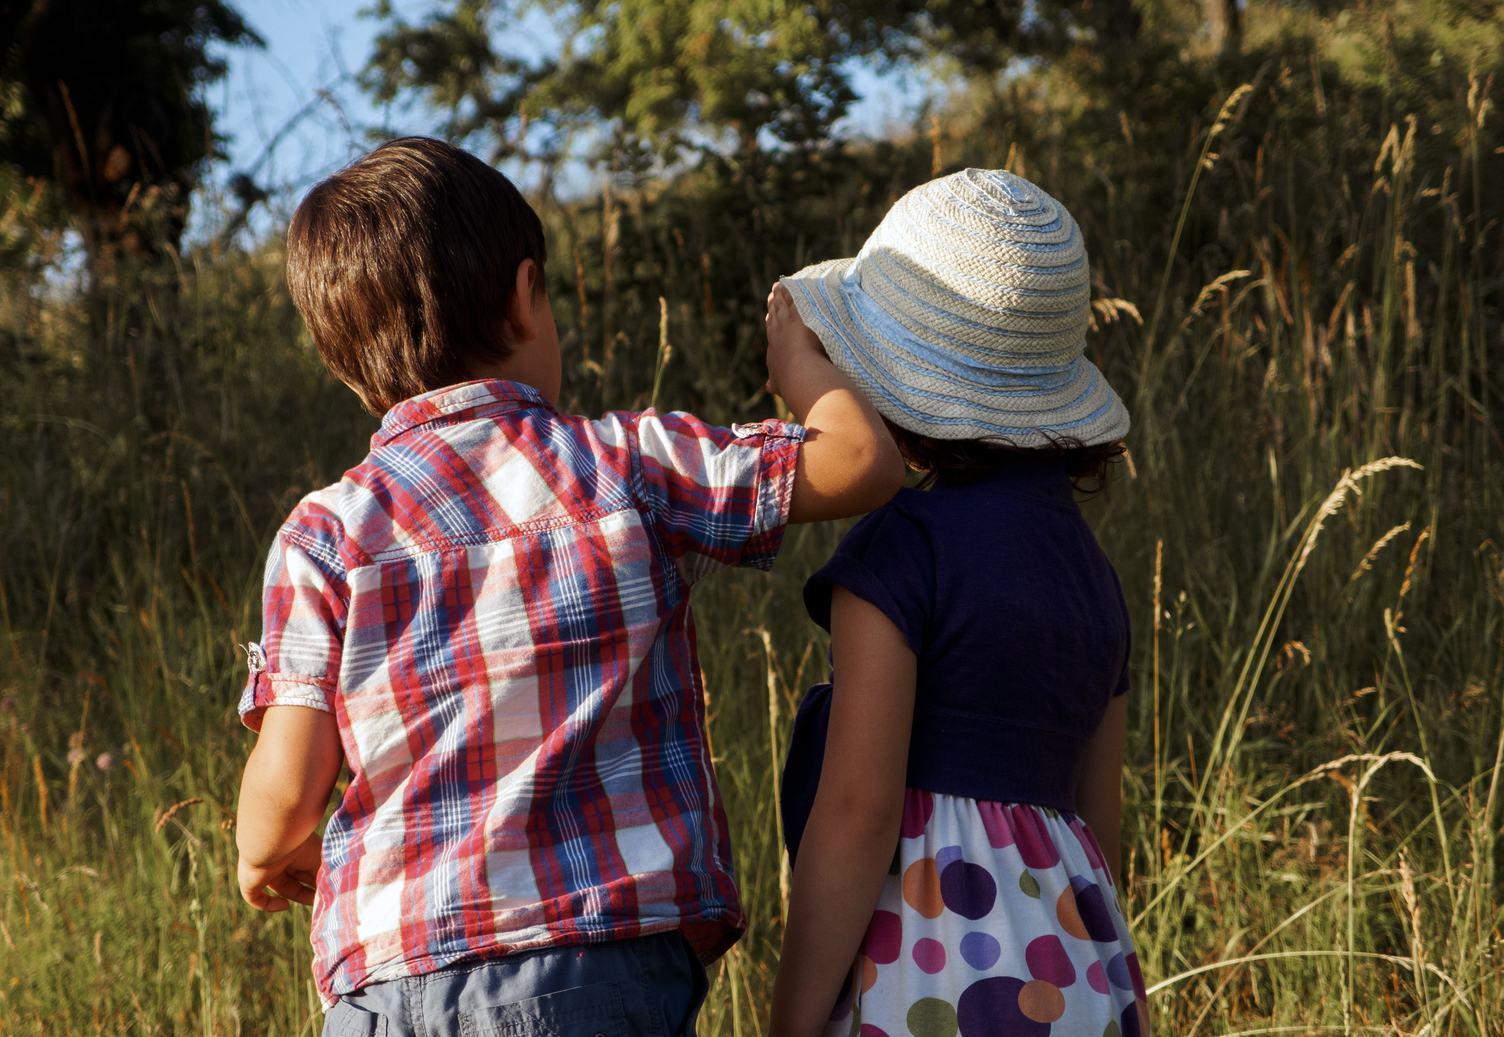 Siblings Playing in the Meadow